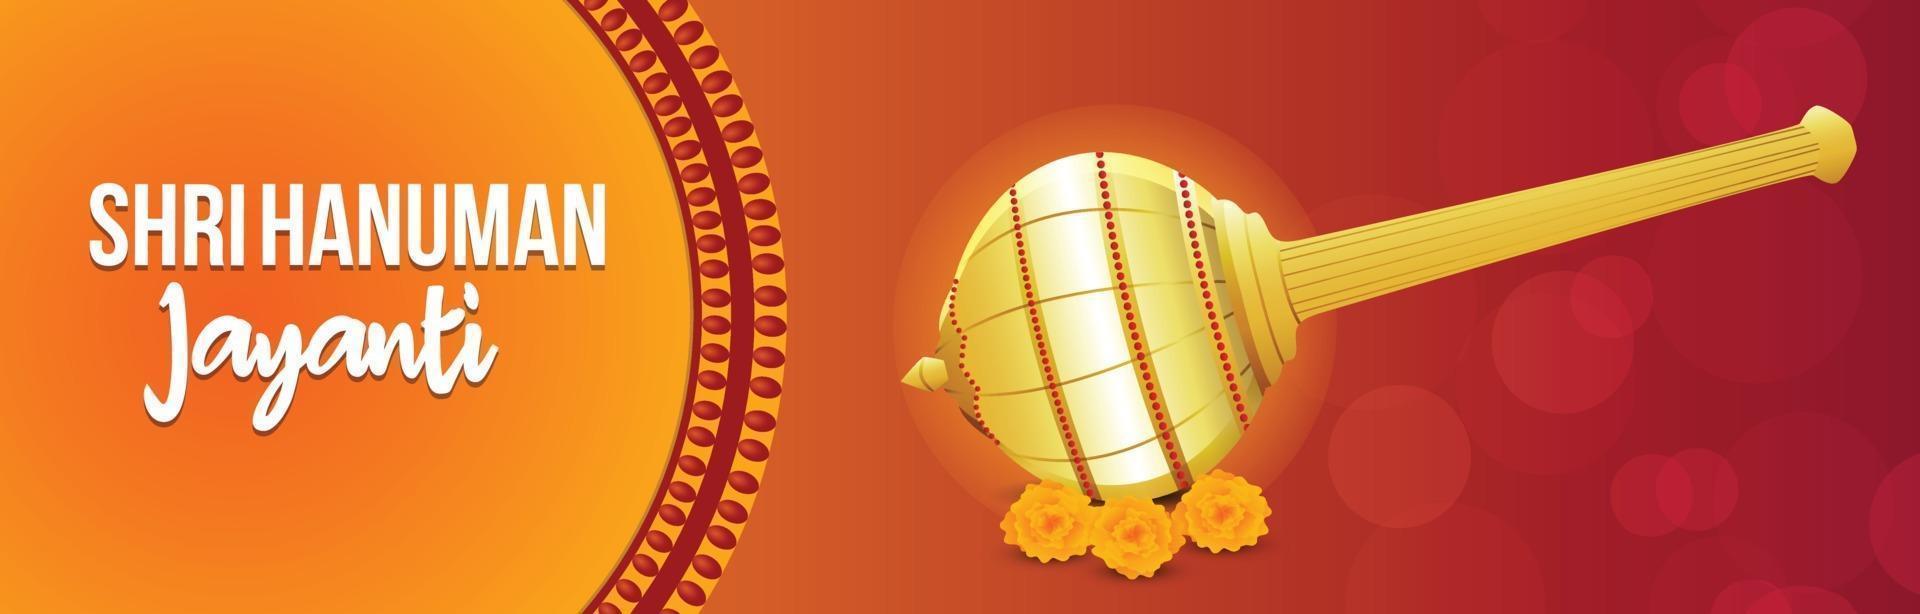 shri hanuman jayanti banner of koptekst vector